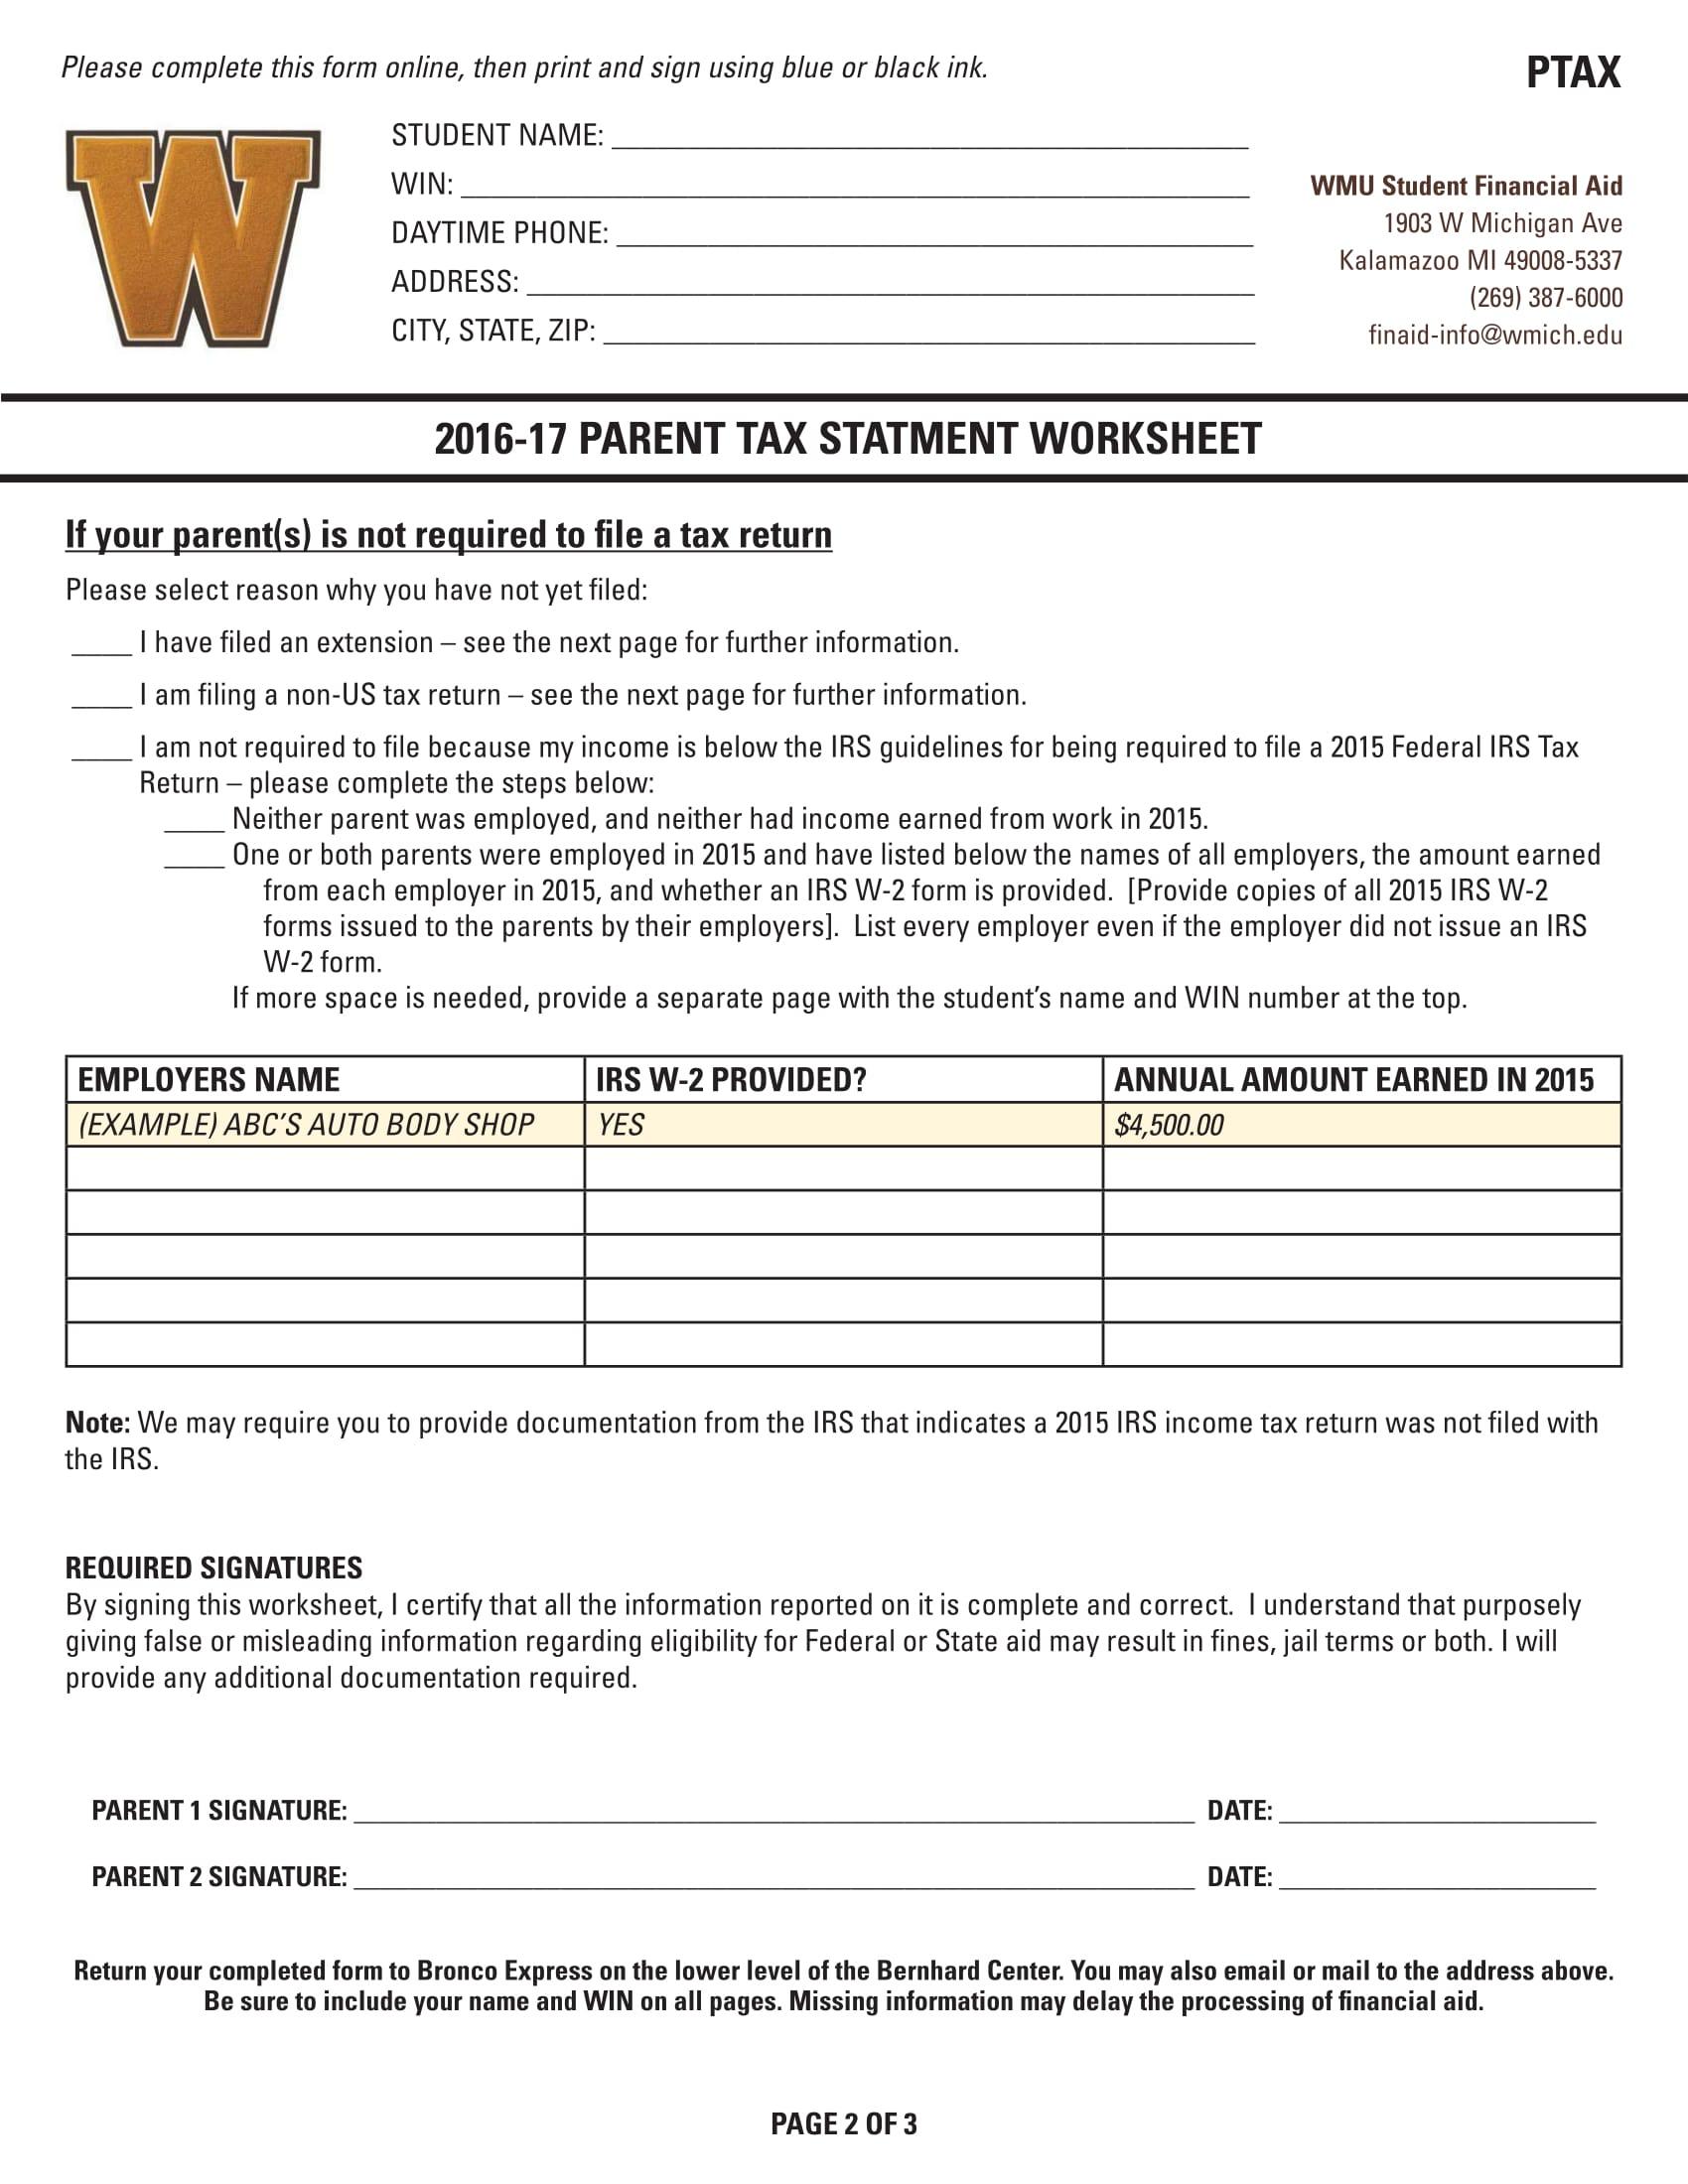 parent tax statement worksheet form 2